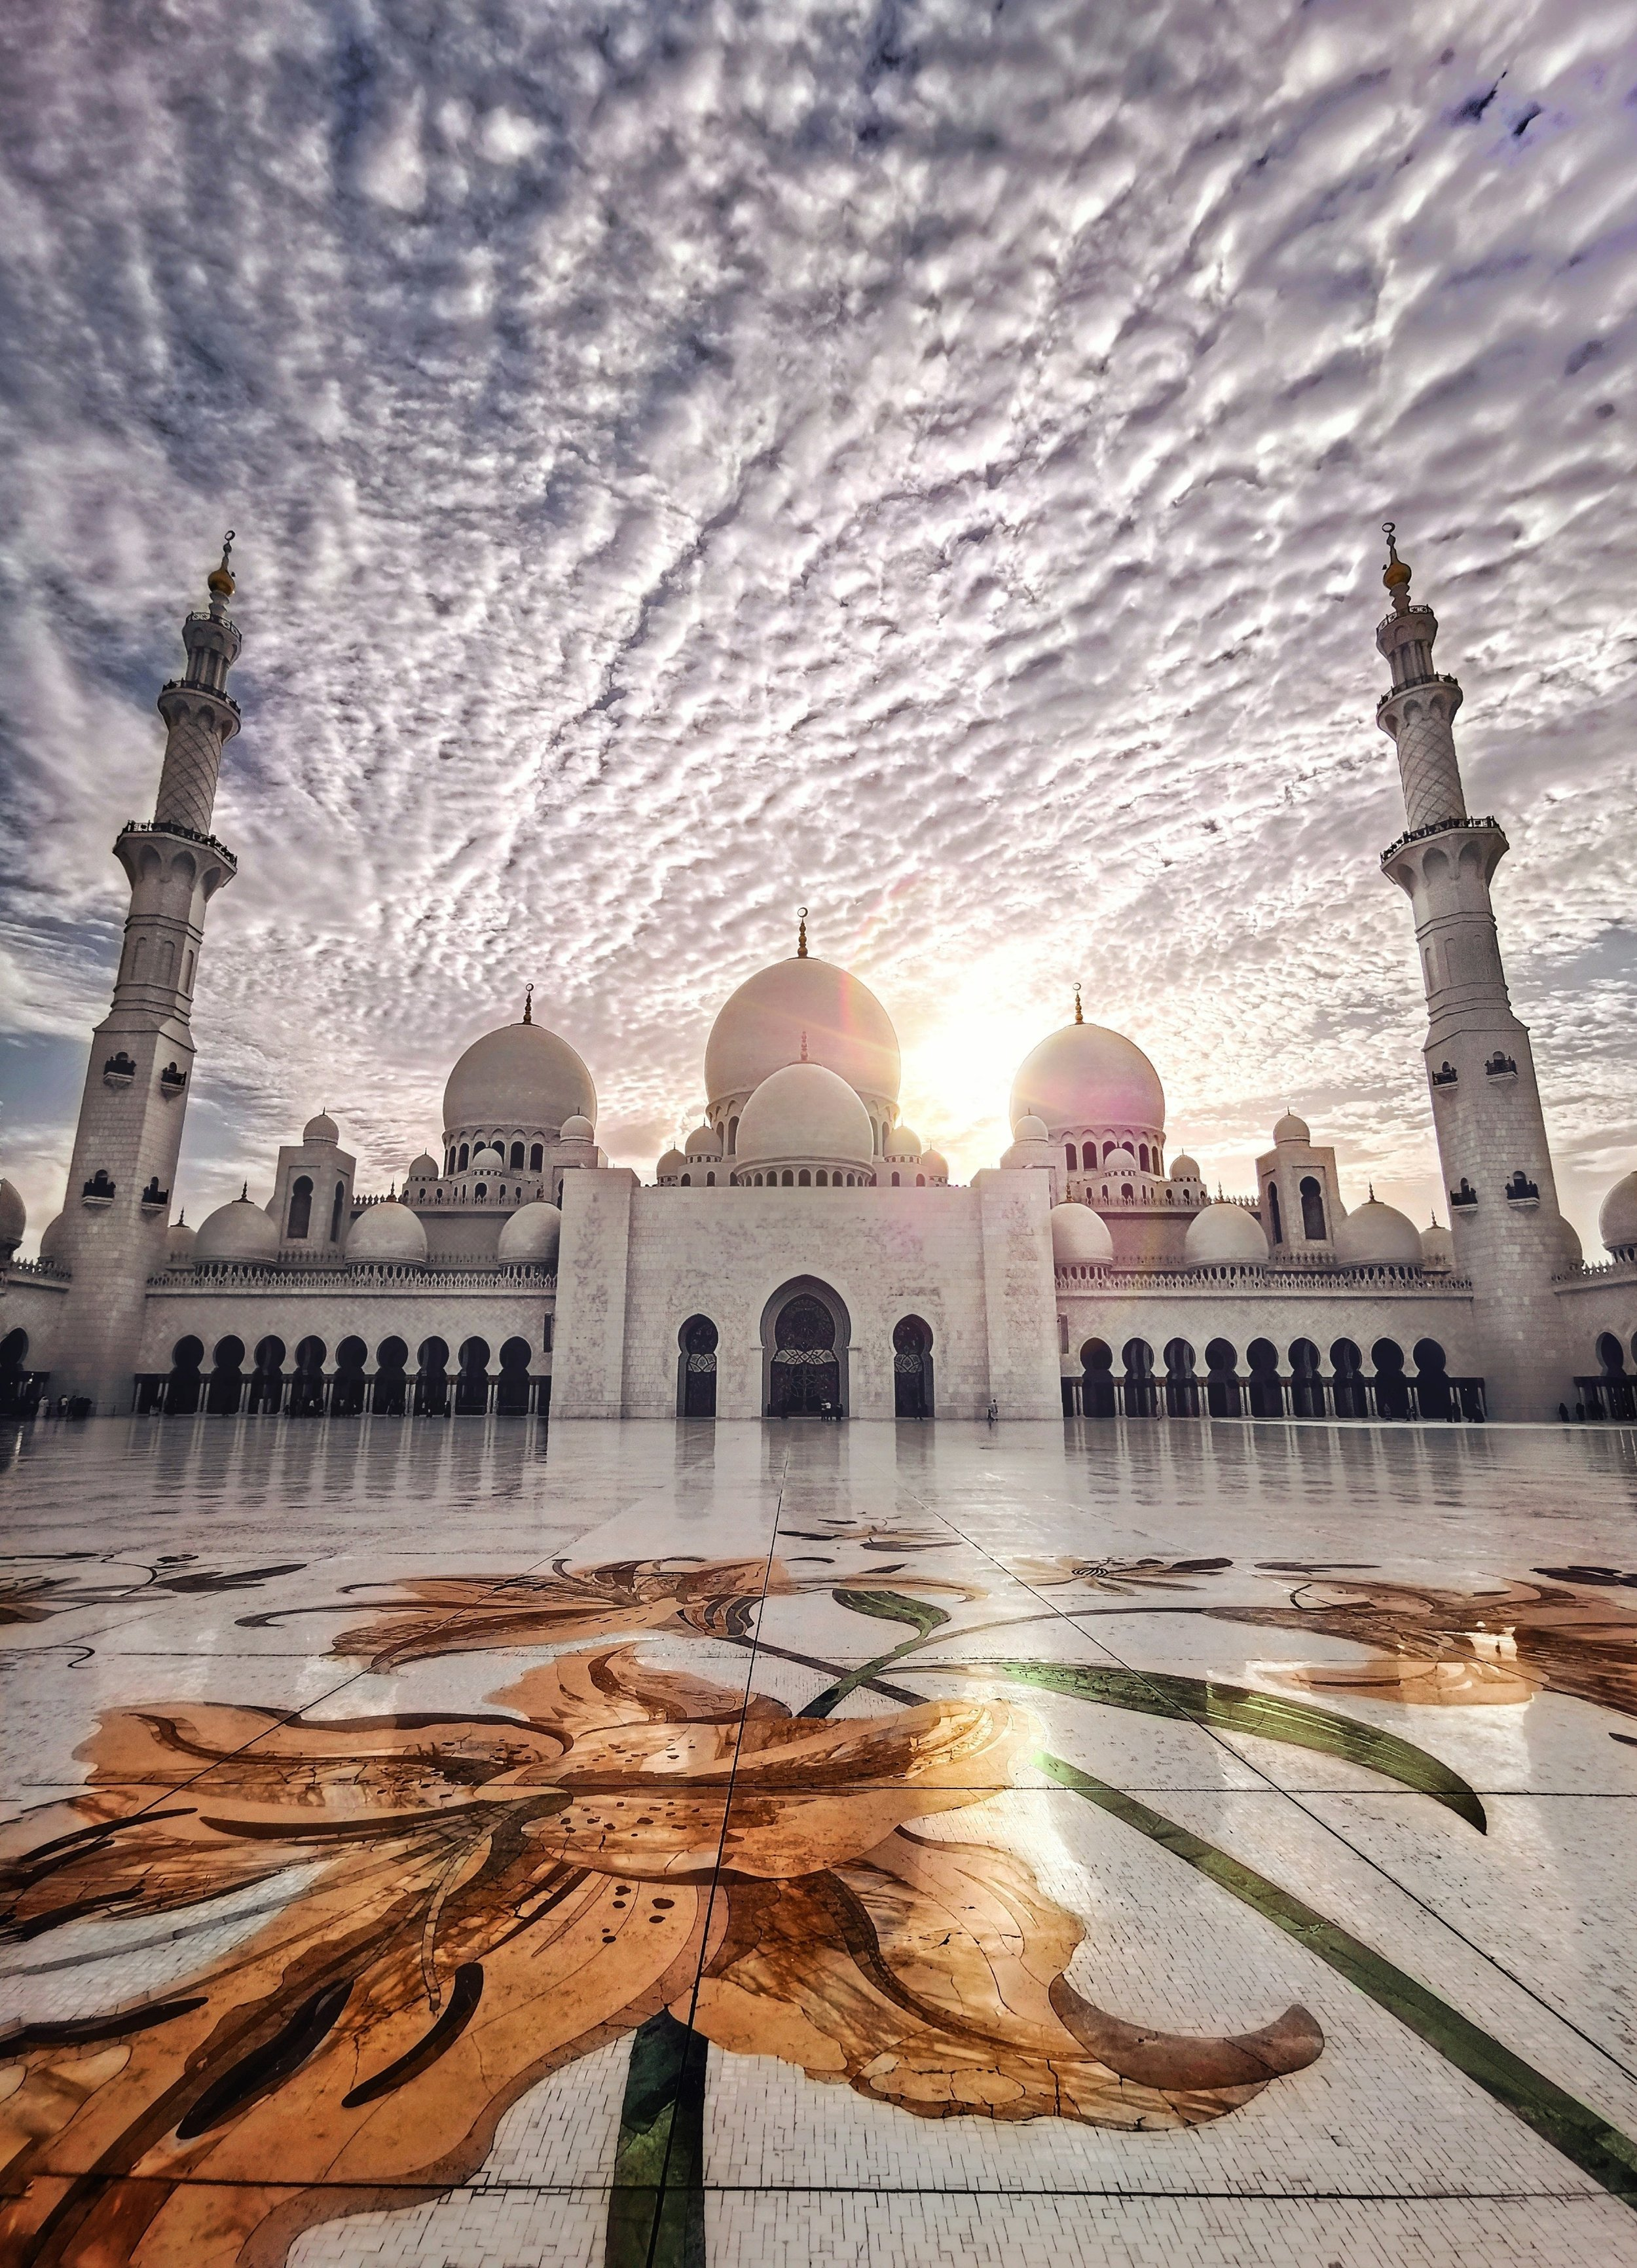 abu-dhabi-architectural-design-architecture-2406731.jpg